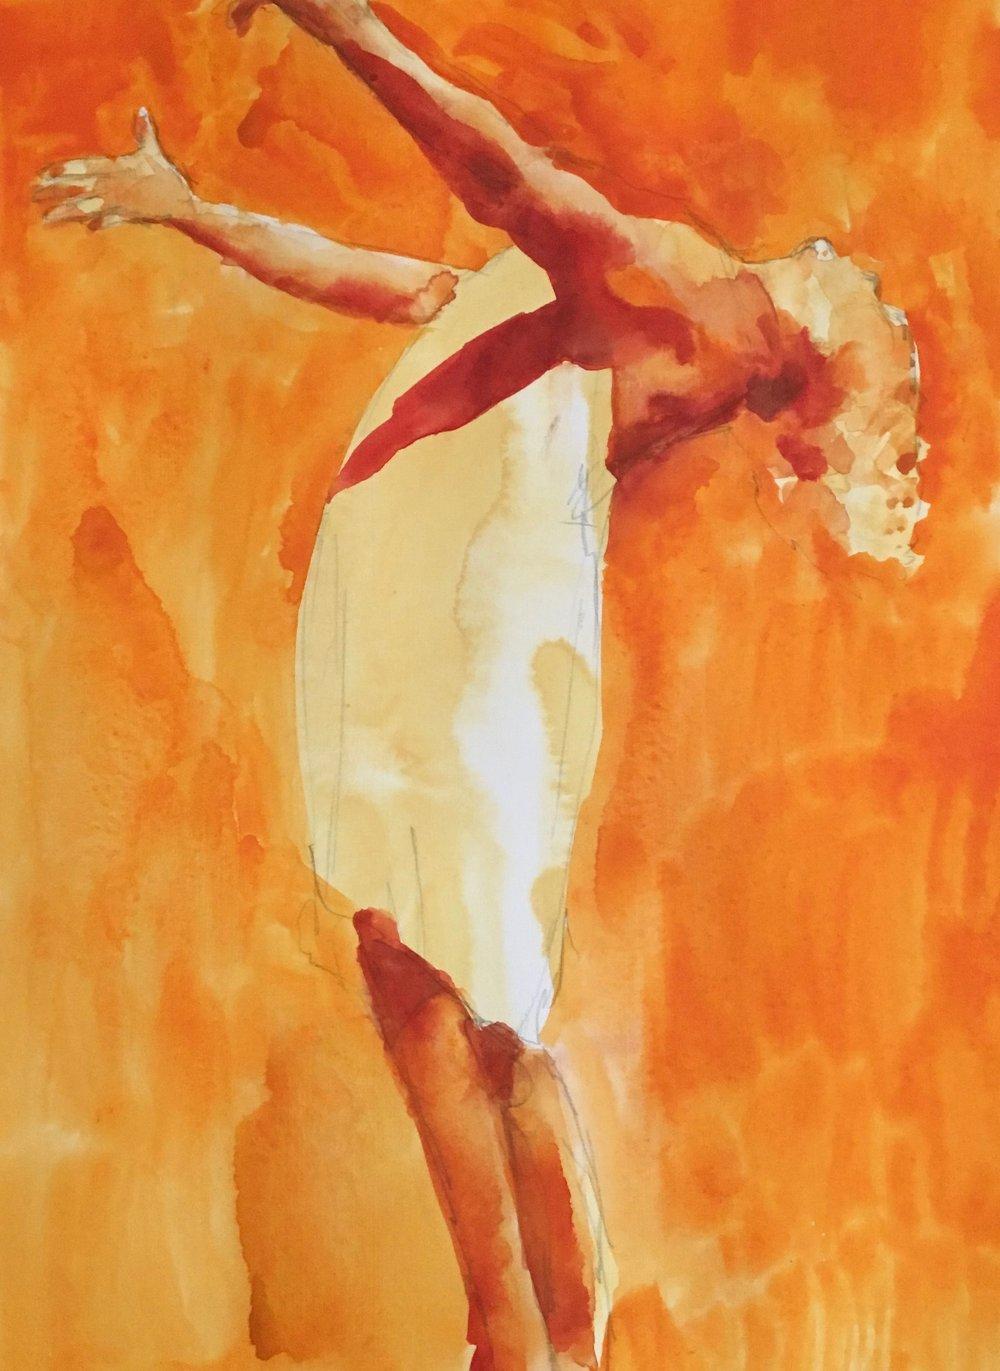 Untitled, 40 x 30 cm, Watercolour, £300